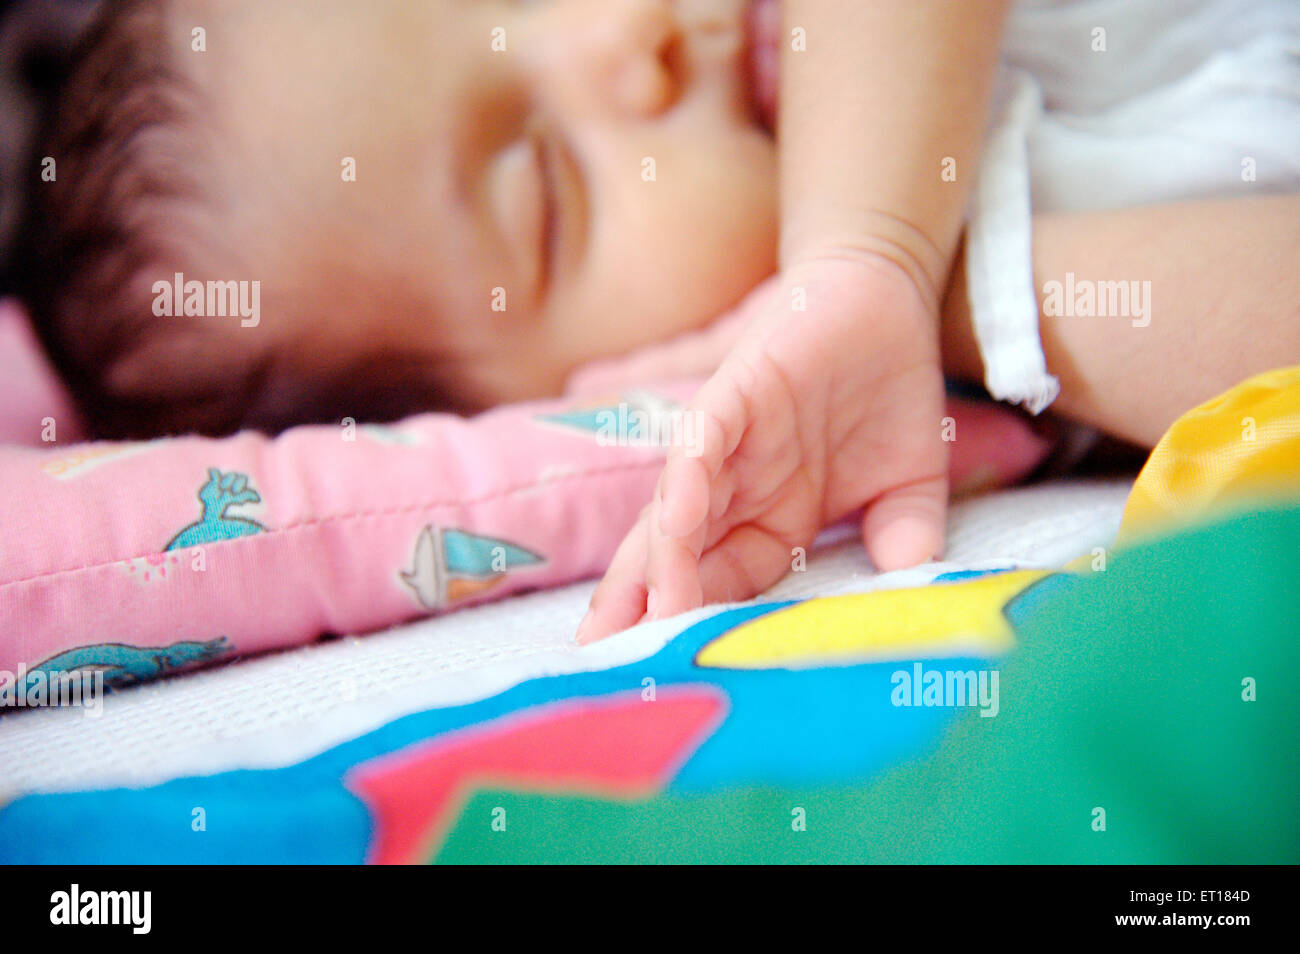 Indische Baby schlafen bedruckte Kissen zarte Finger - HERR #736 LA Stockbild